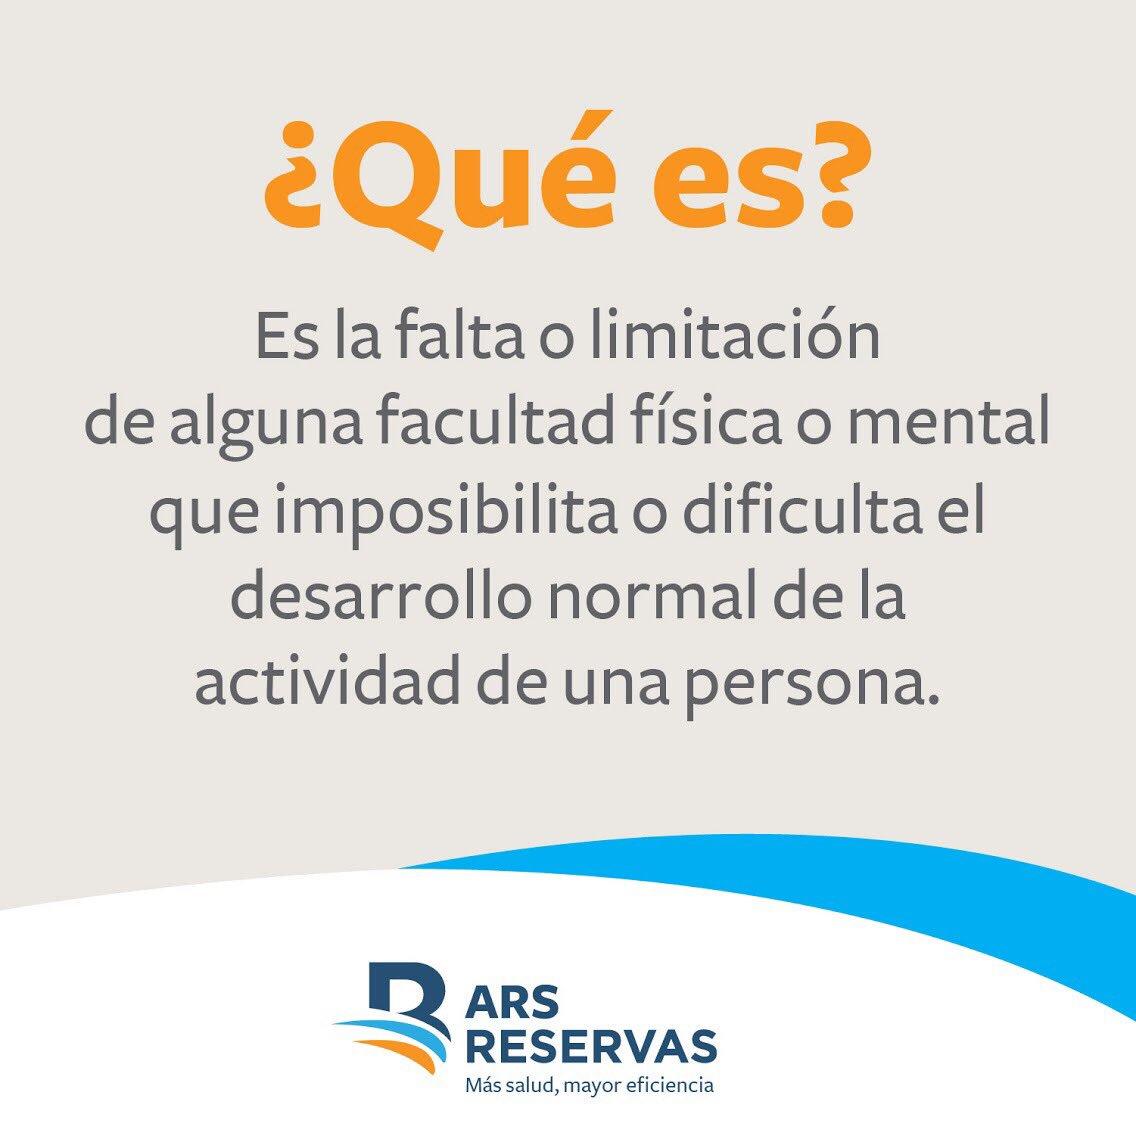 Ars Reservas A Twitter La